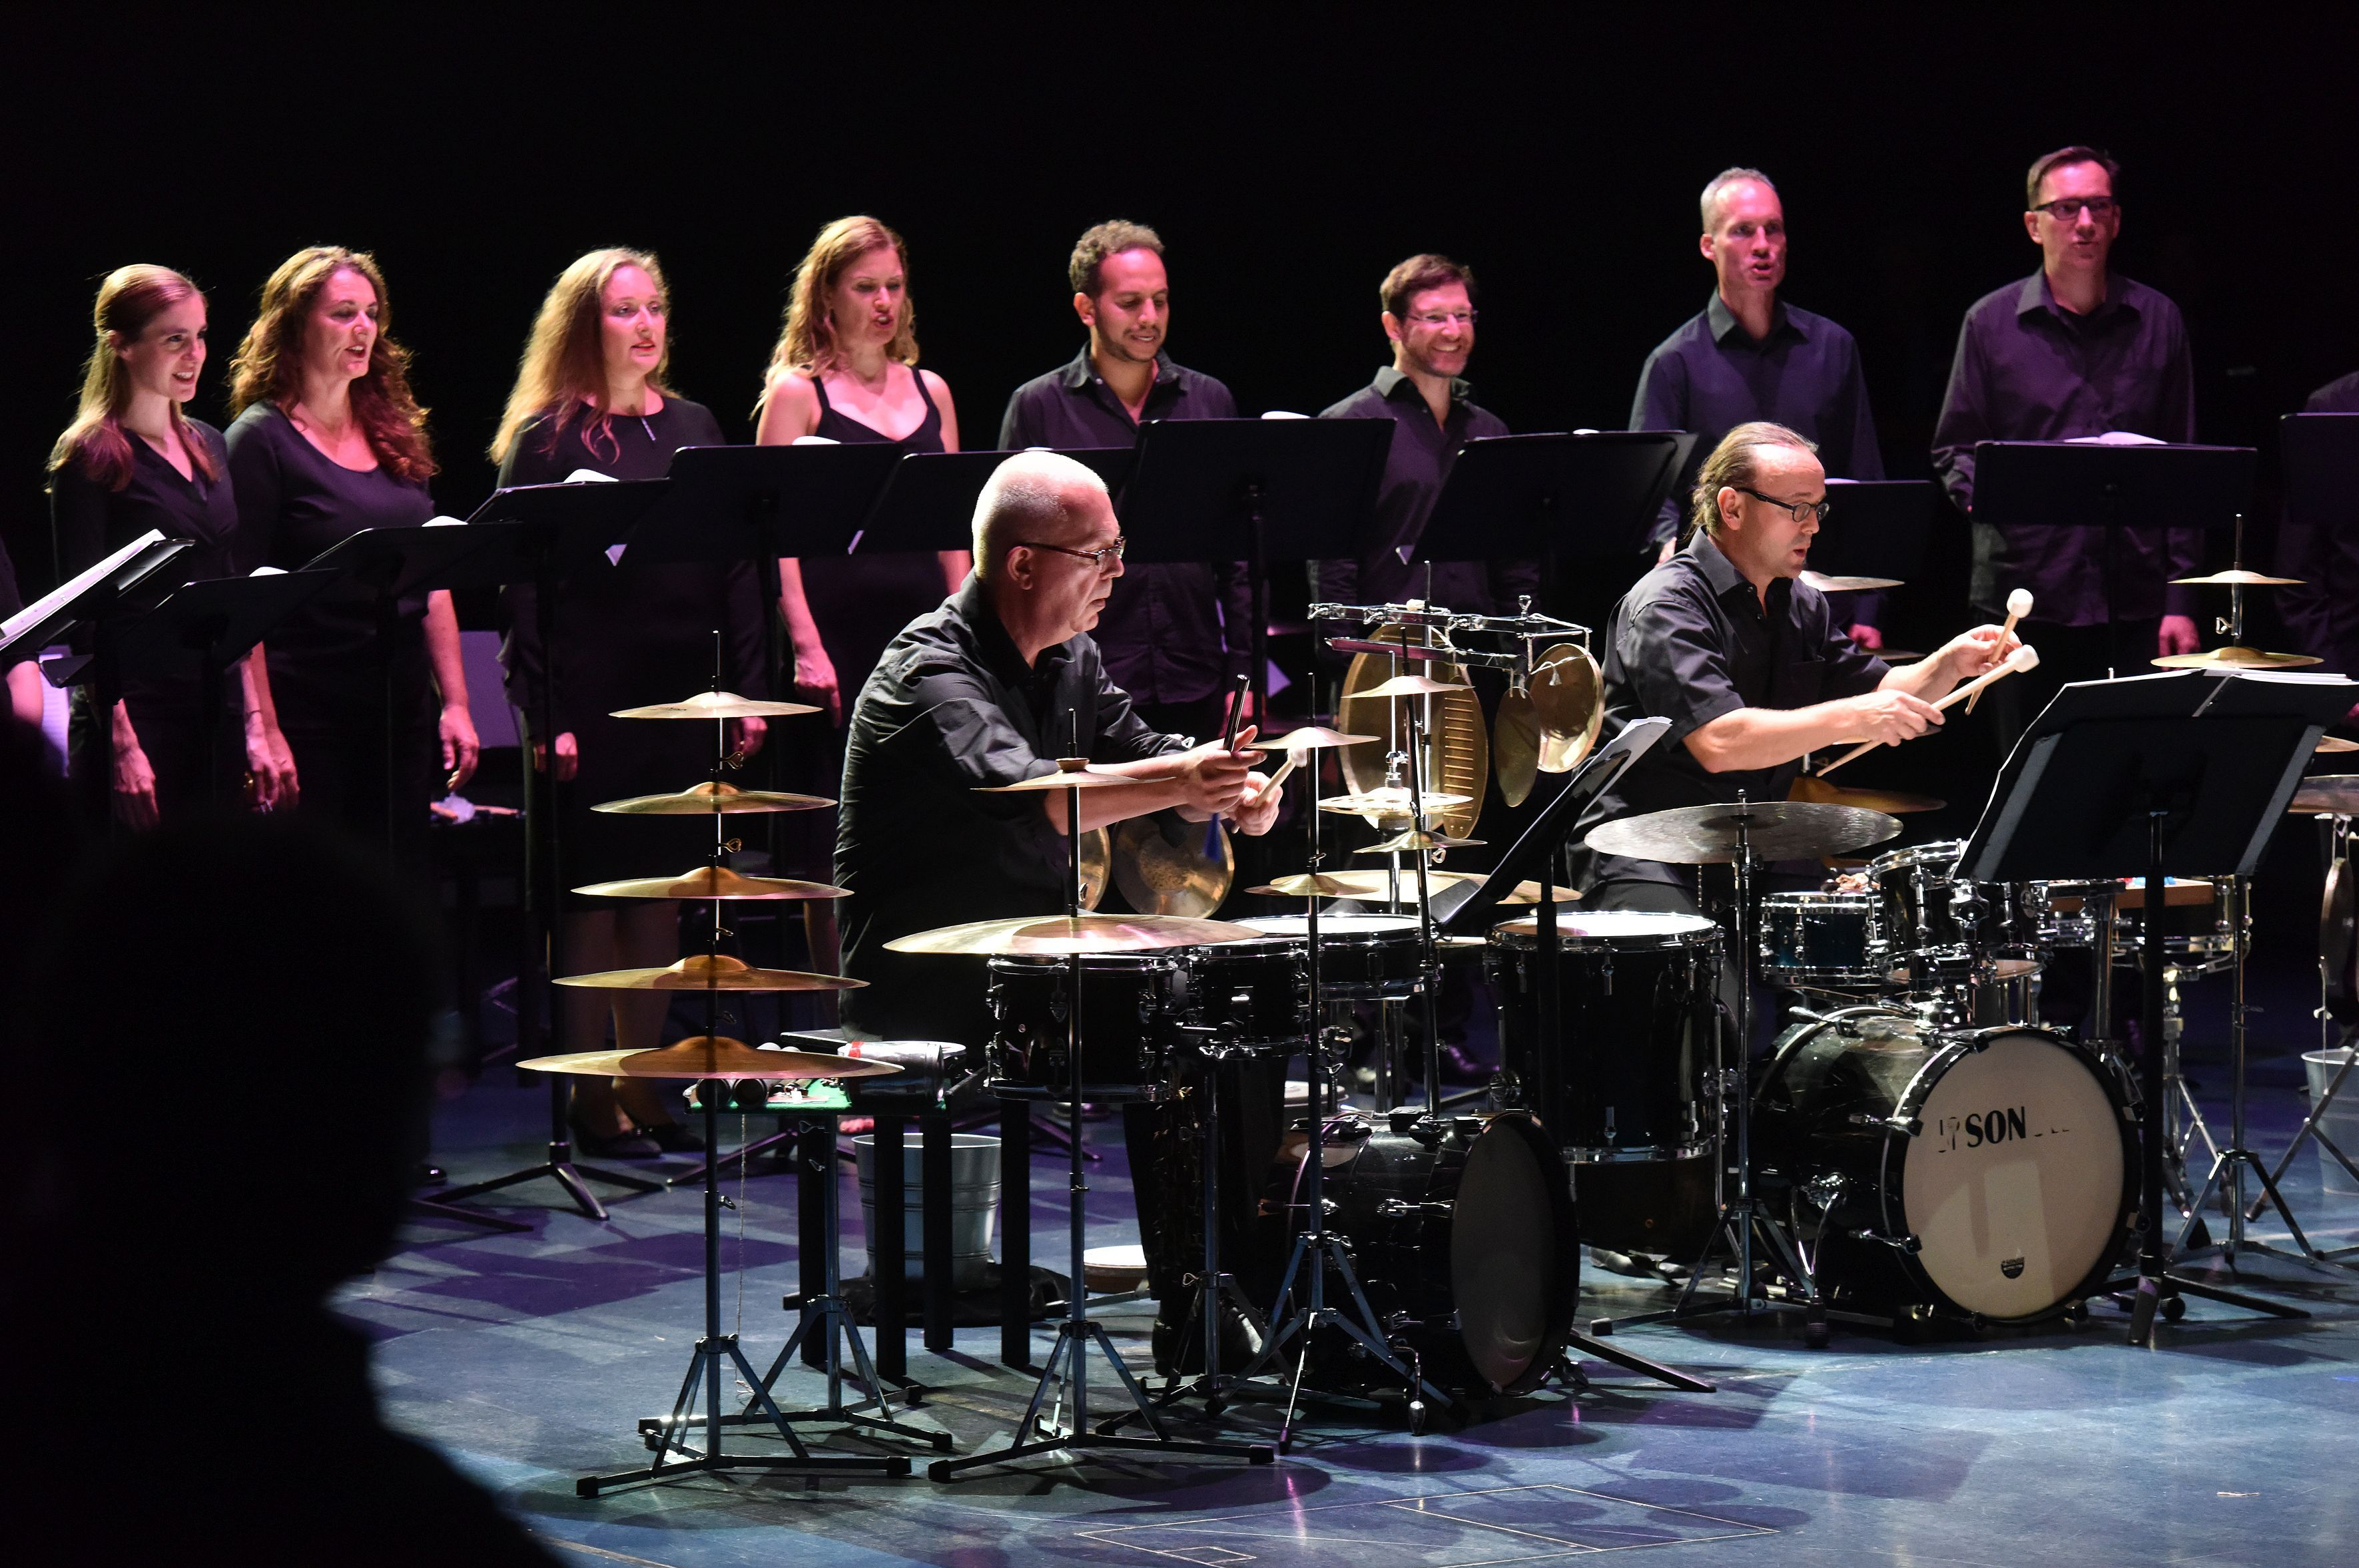 Wo das Lucerne Festival Energien holt – Peter Hagmann, Musikkritiker